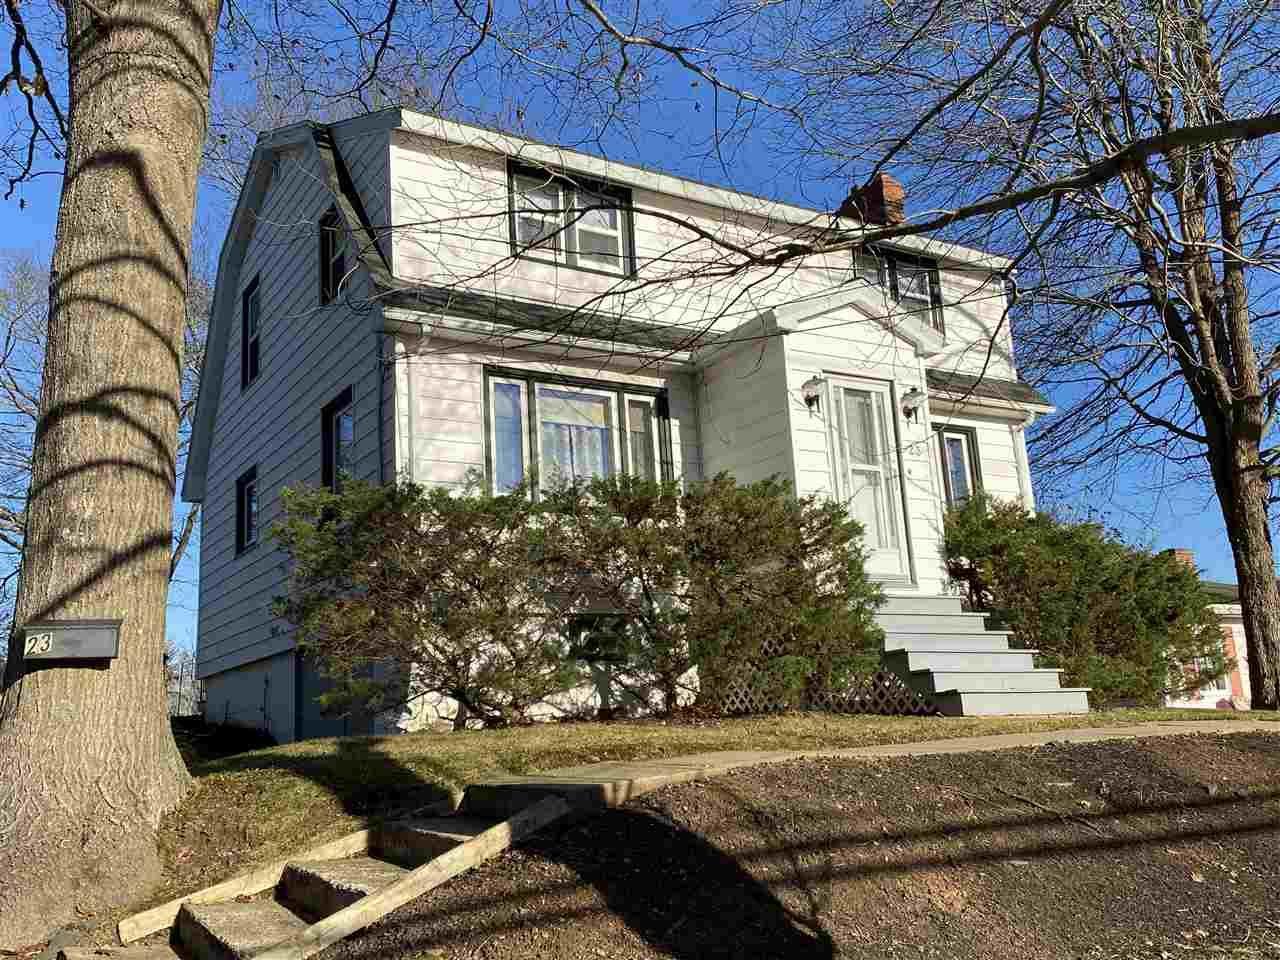 Main Photo: 23 Bridge Street in Bedford: 20-Bedford Residential for sale (Halifax-Dartmouth)  : MLS®# 202024956